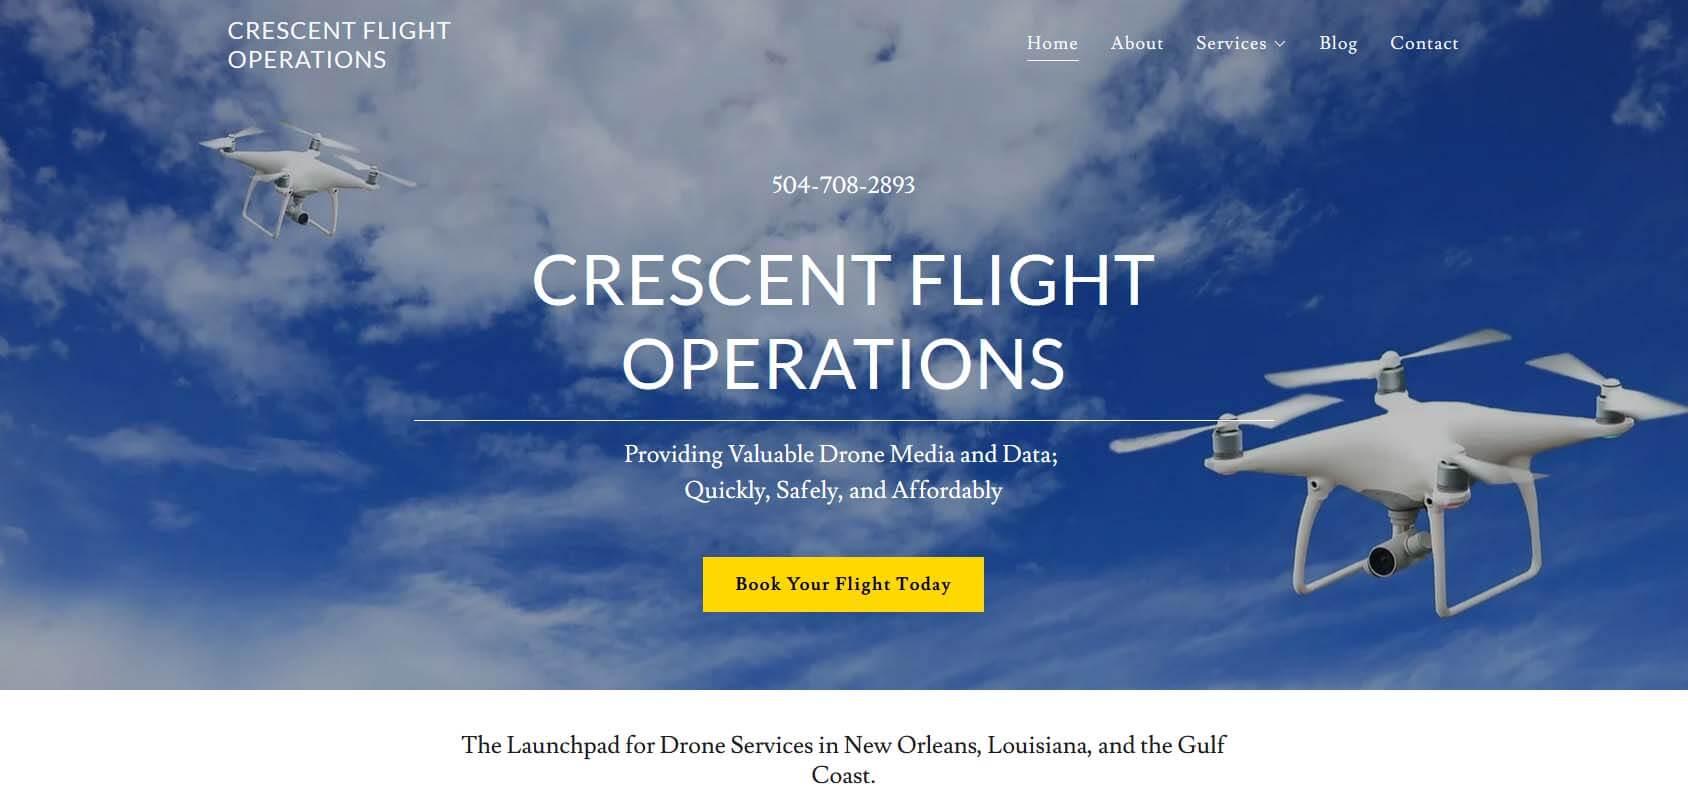 Crescent Flight Operations Homepage